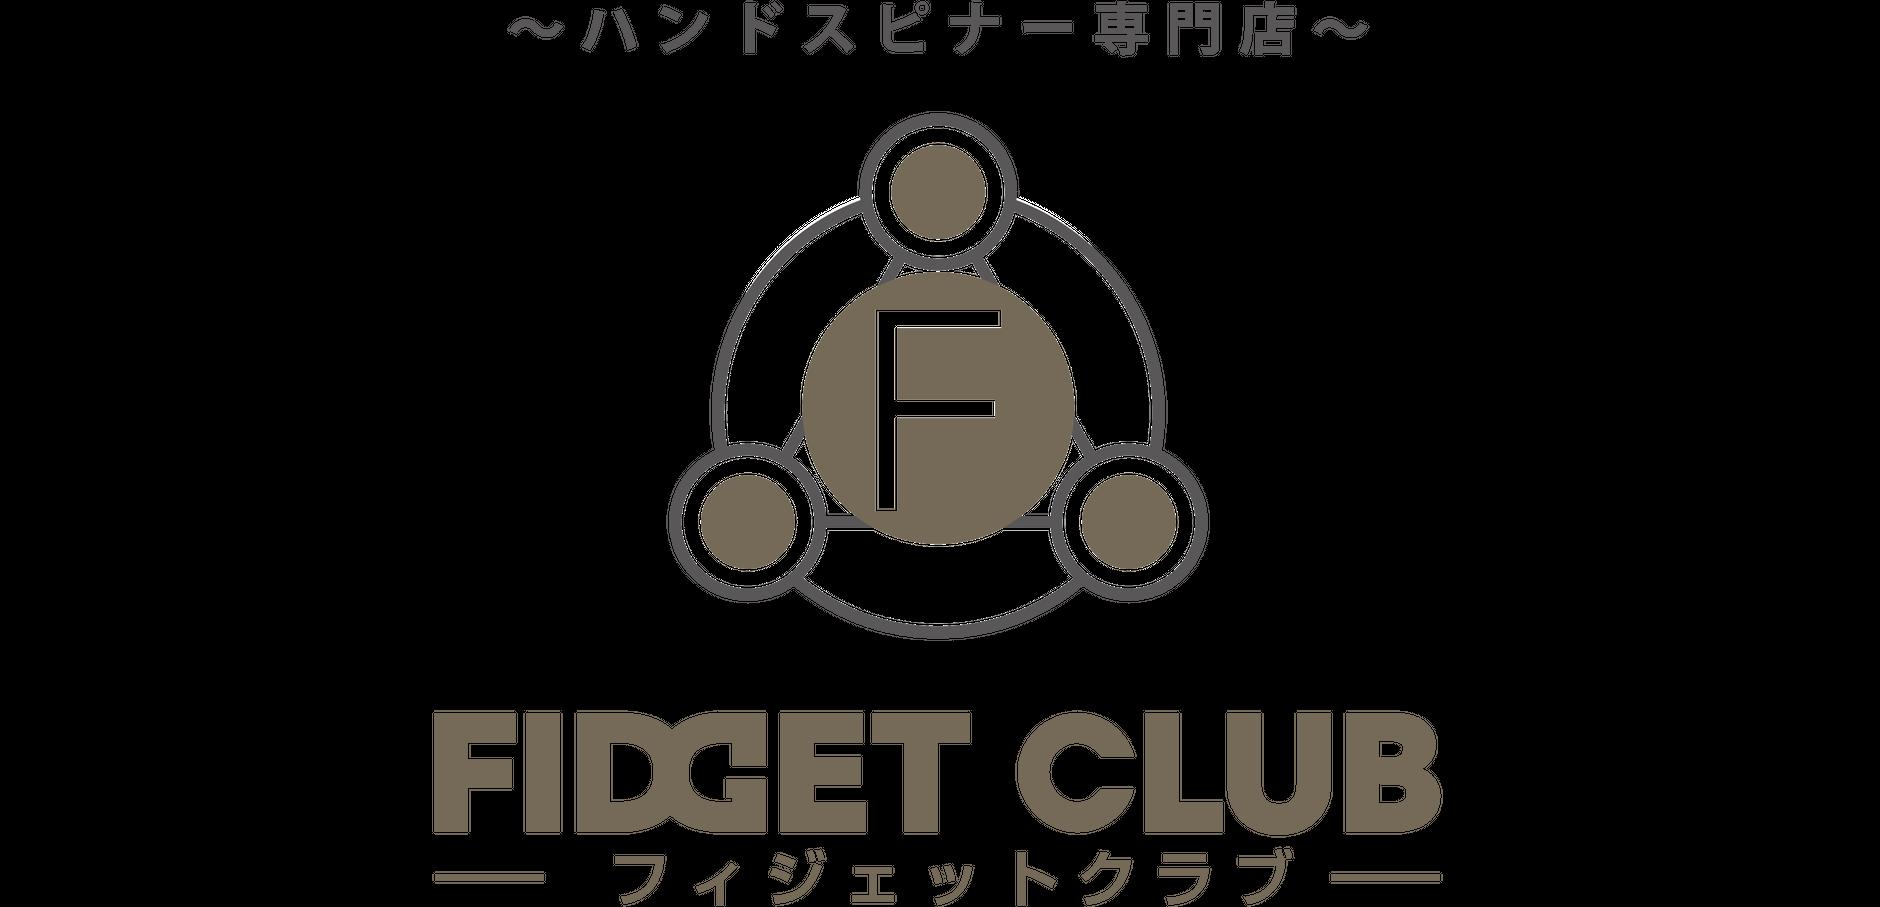 FIDGET CLUB〜フィジェットクラブ〜